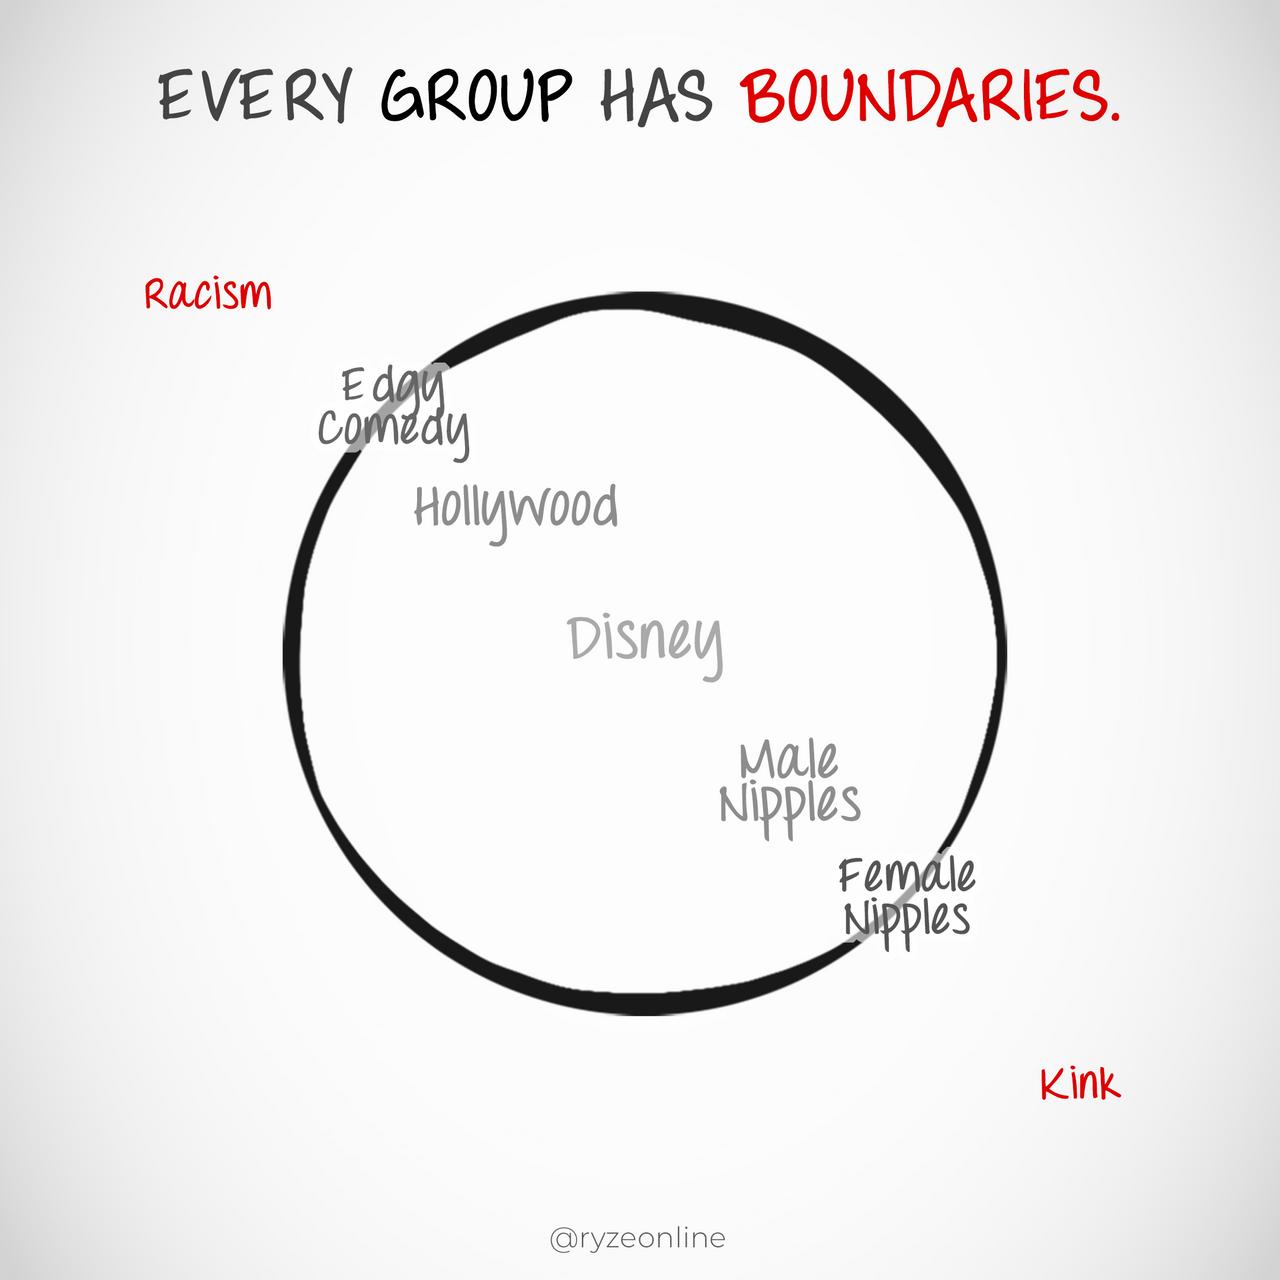 Censor_040_Boundaries_Society.png